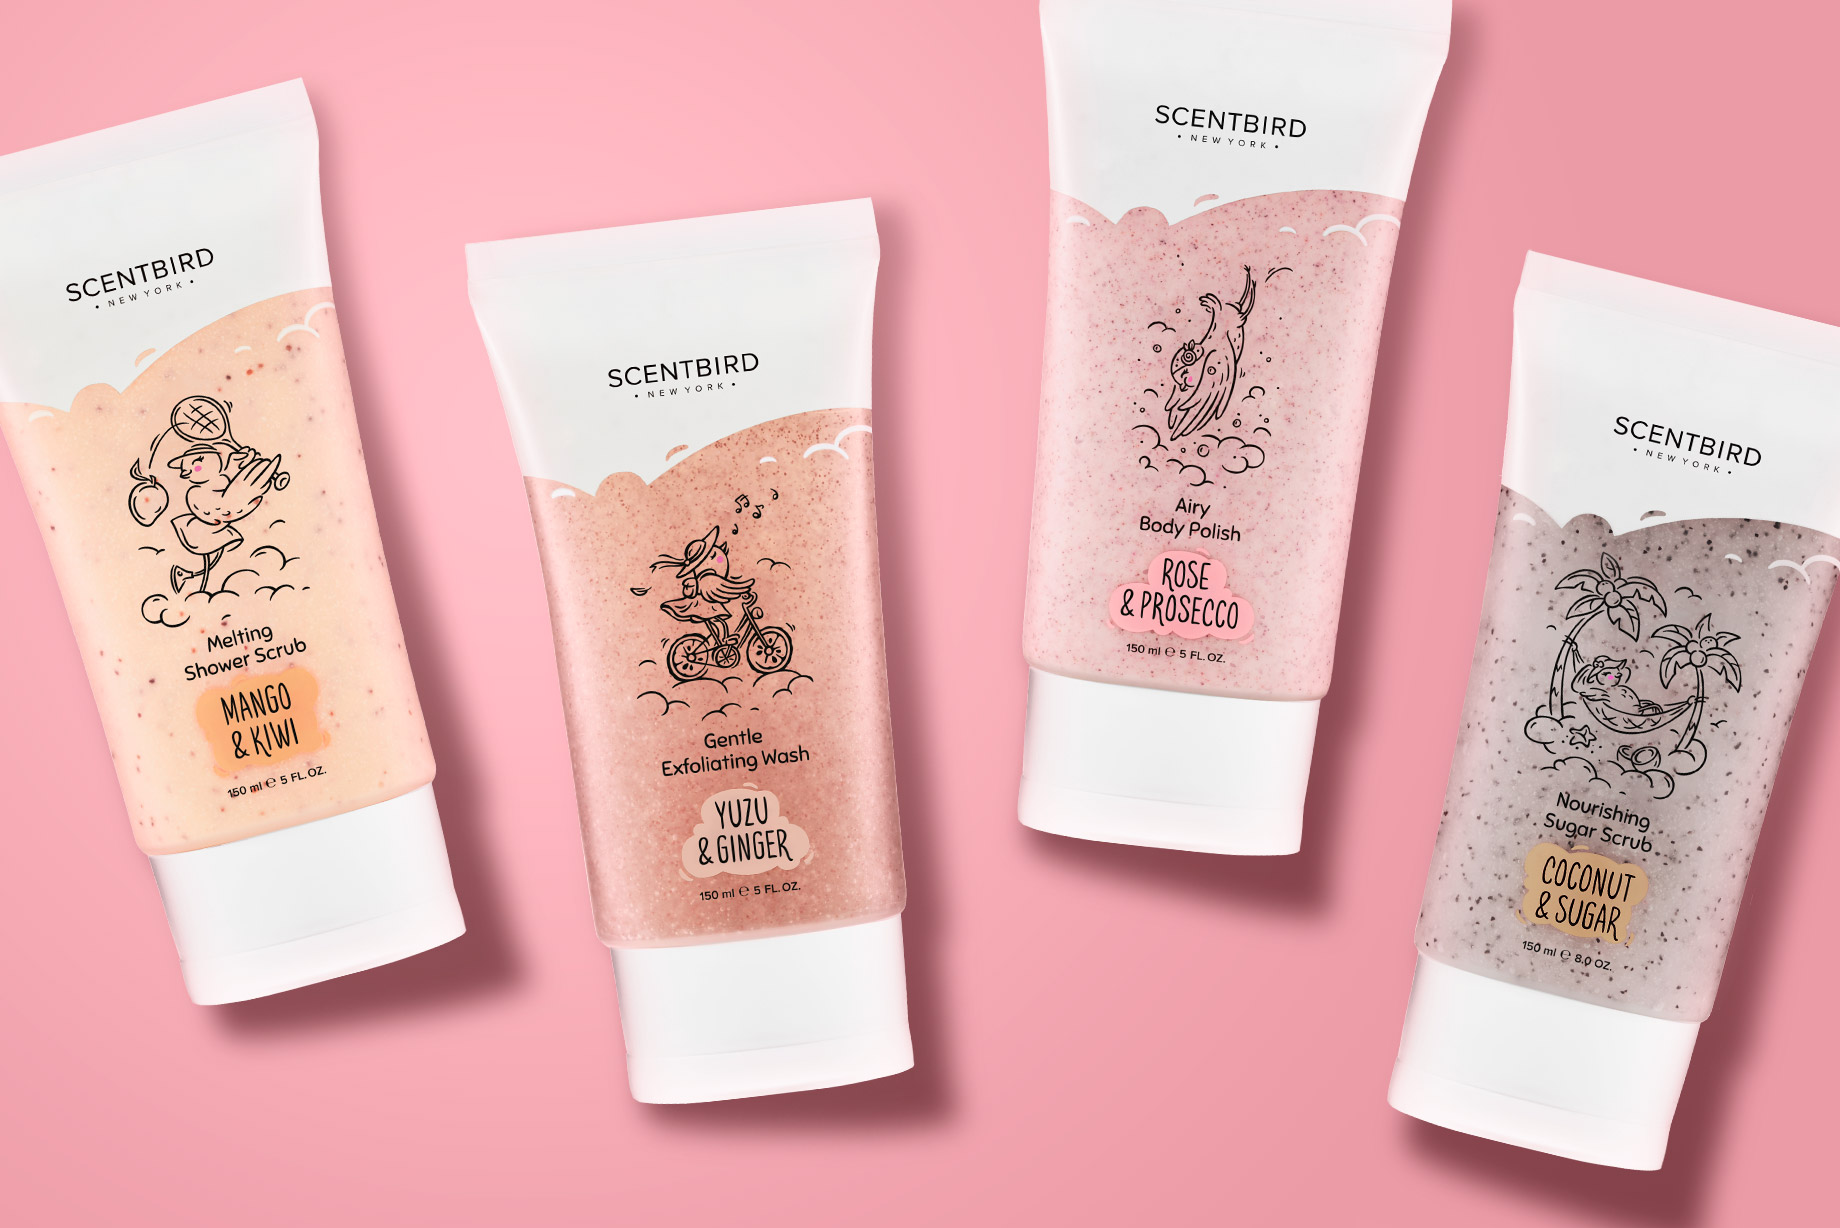 The Best Body Scrubs for Sun-kissed Skin